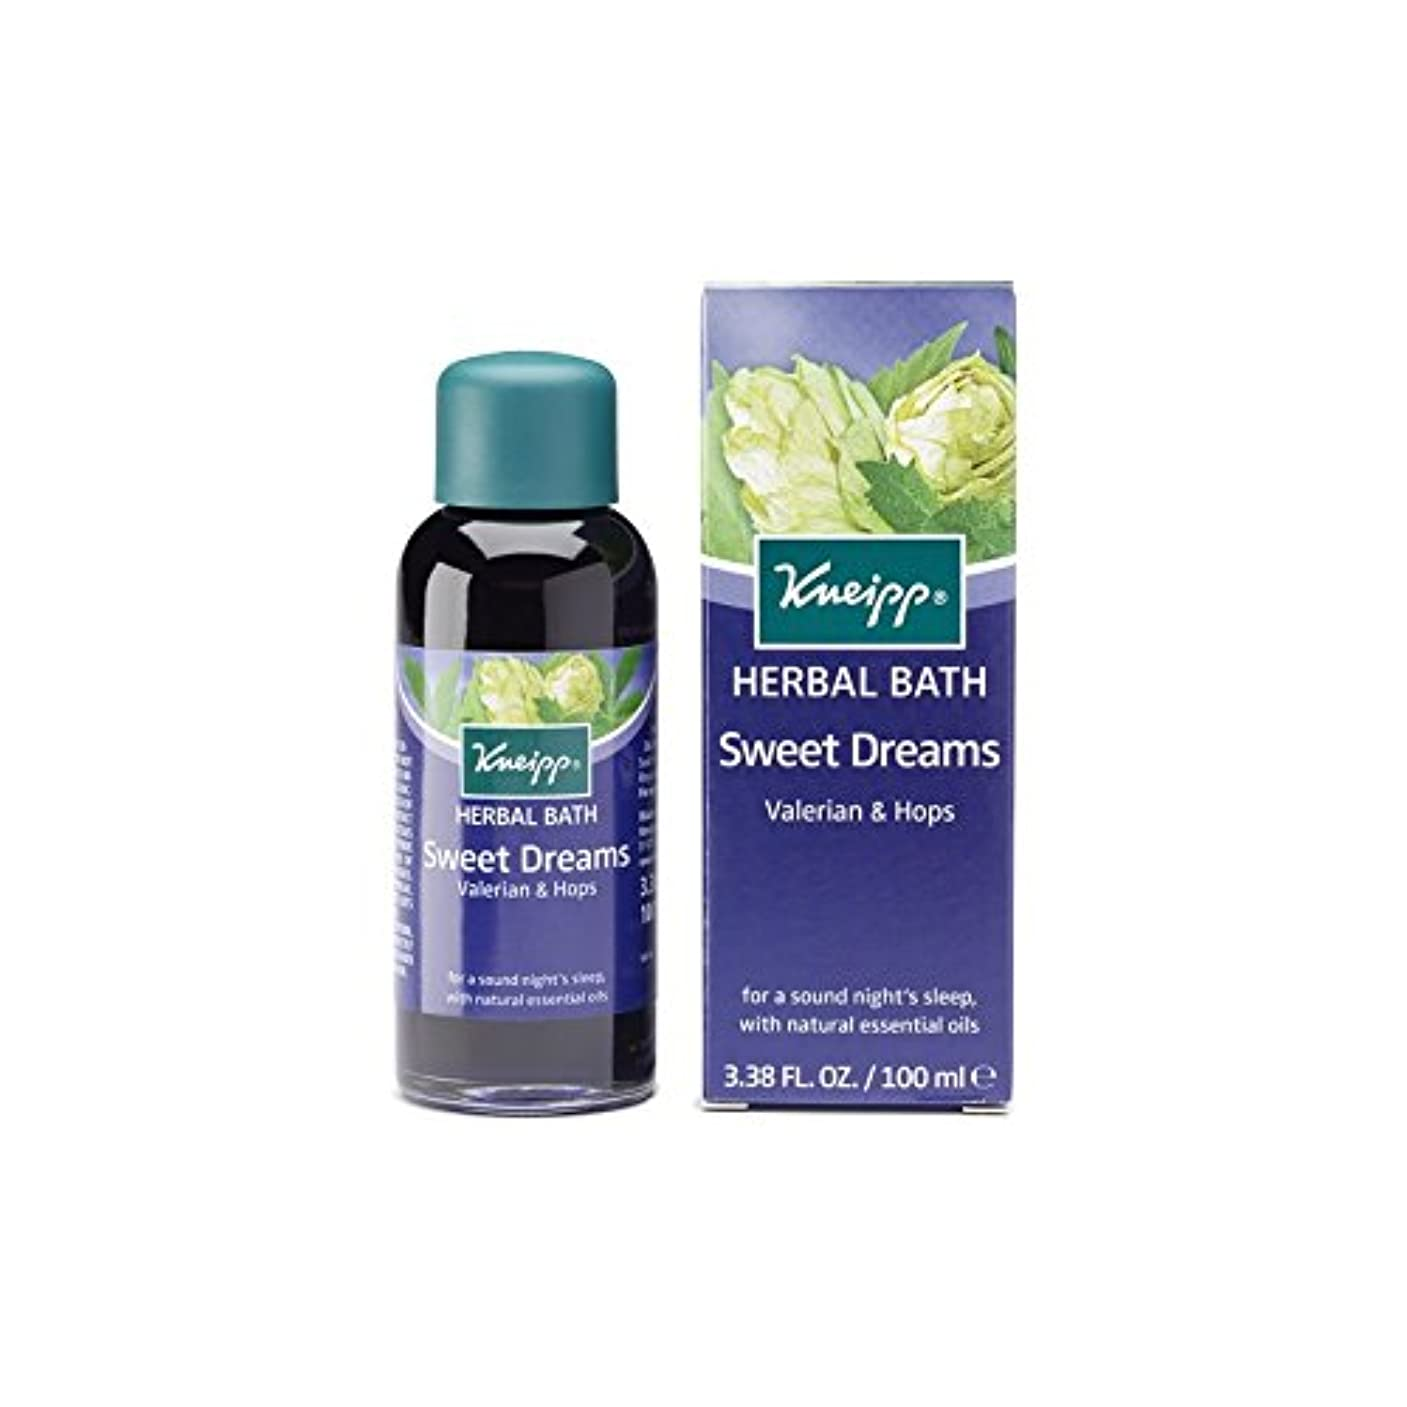 Kneipp Sweet Dreams Herbal Valerian and Hops Bath Oil (100ml) (Pack of 6) - クナイプ甘い夢ハーブカノコソウとバスオイル(100ミリリットル)をホップ...